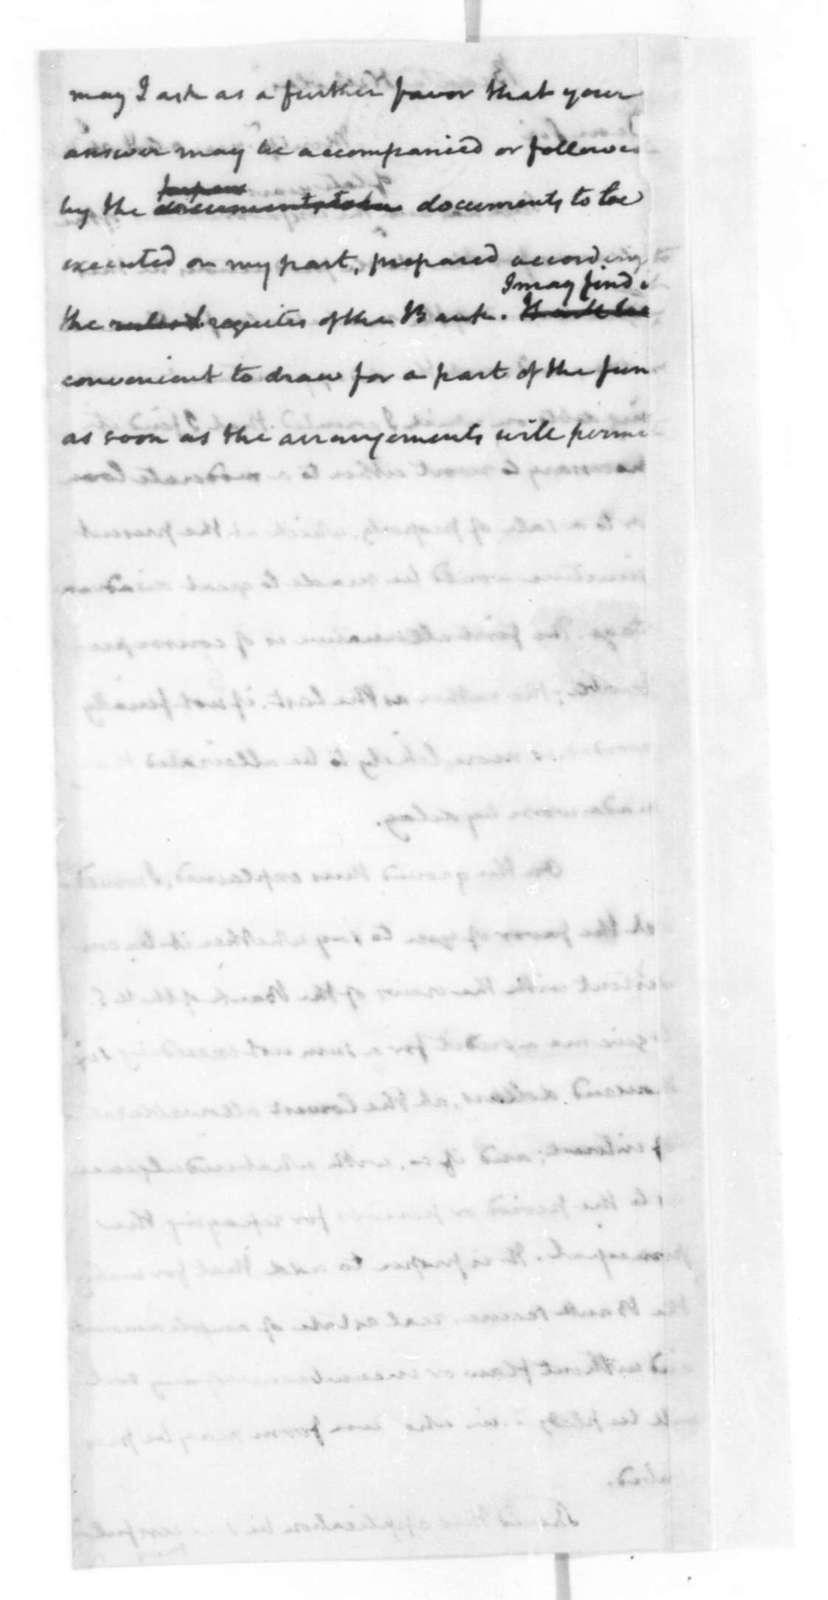 James Madison to Nicholas Biddle, April 16, 1825.